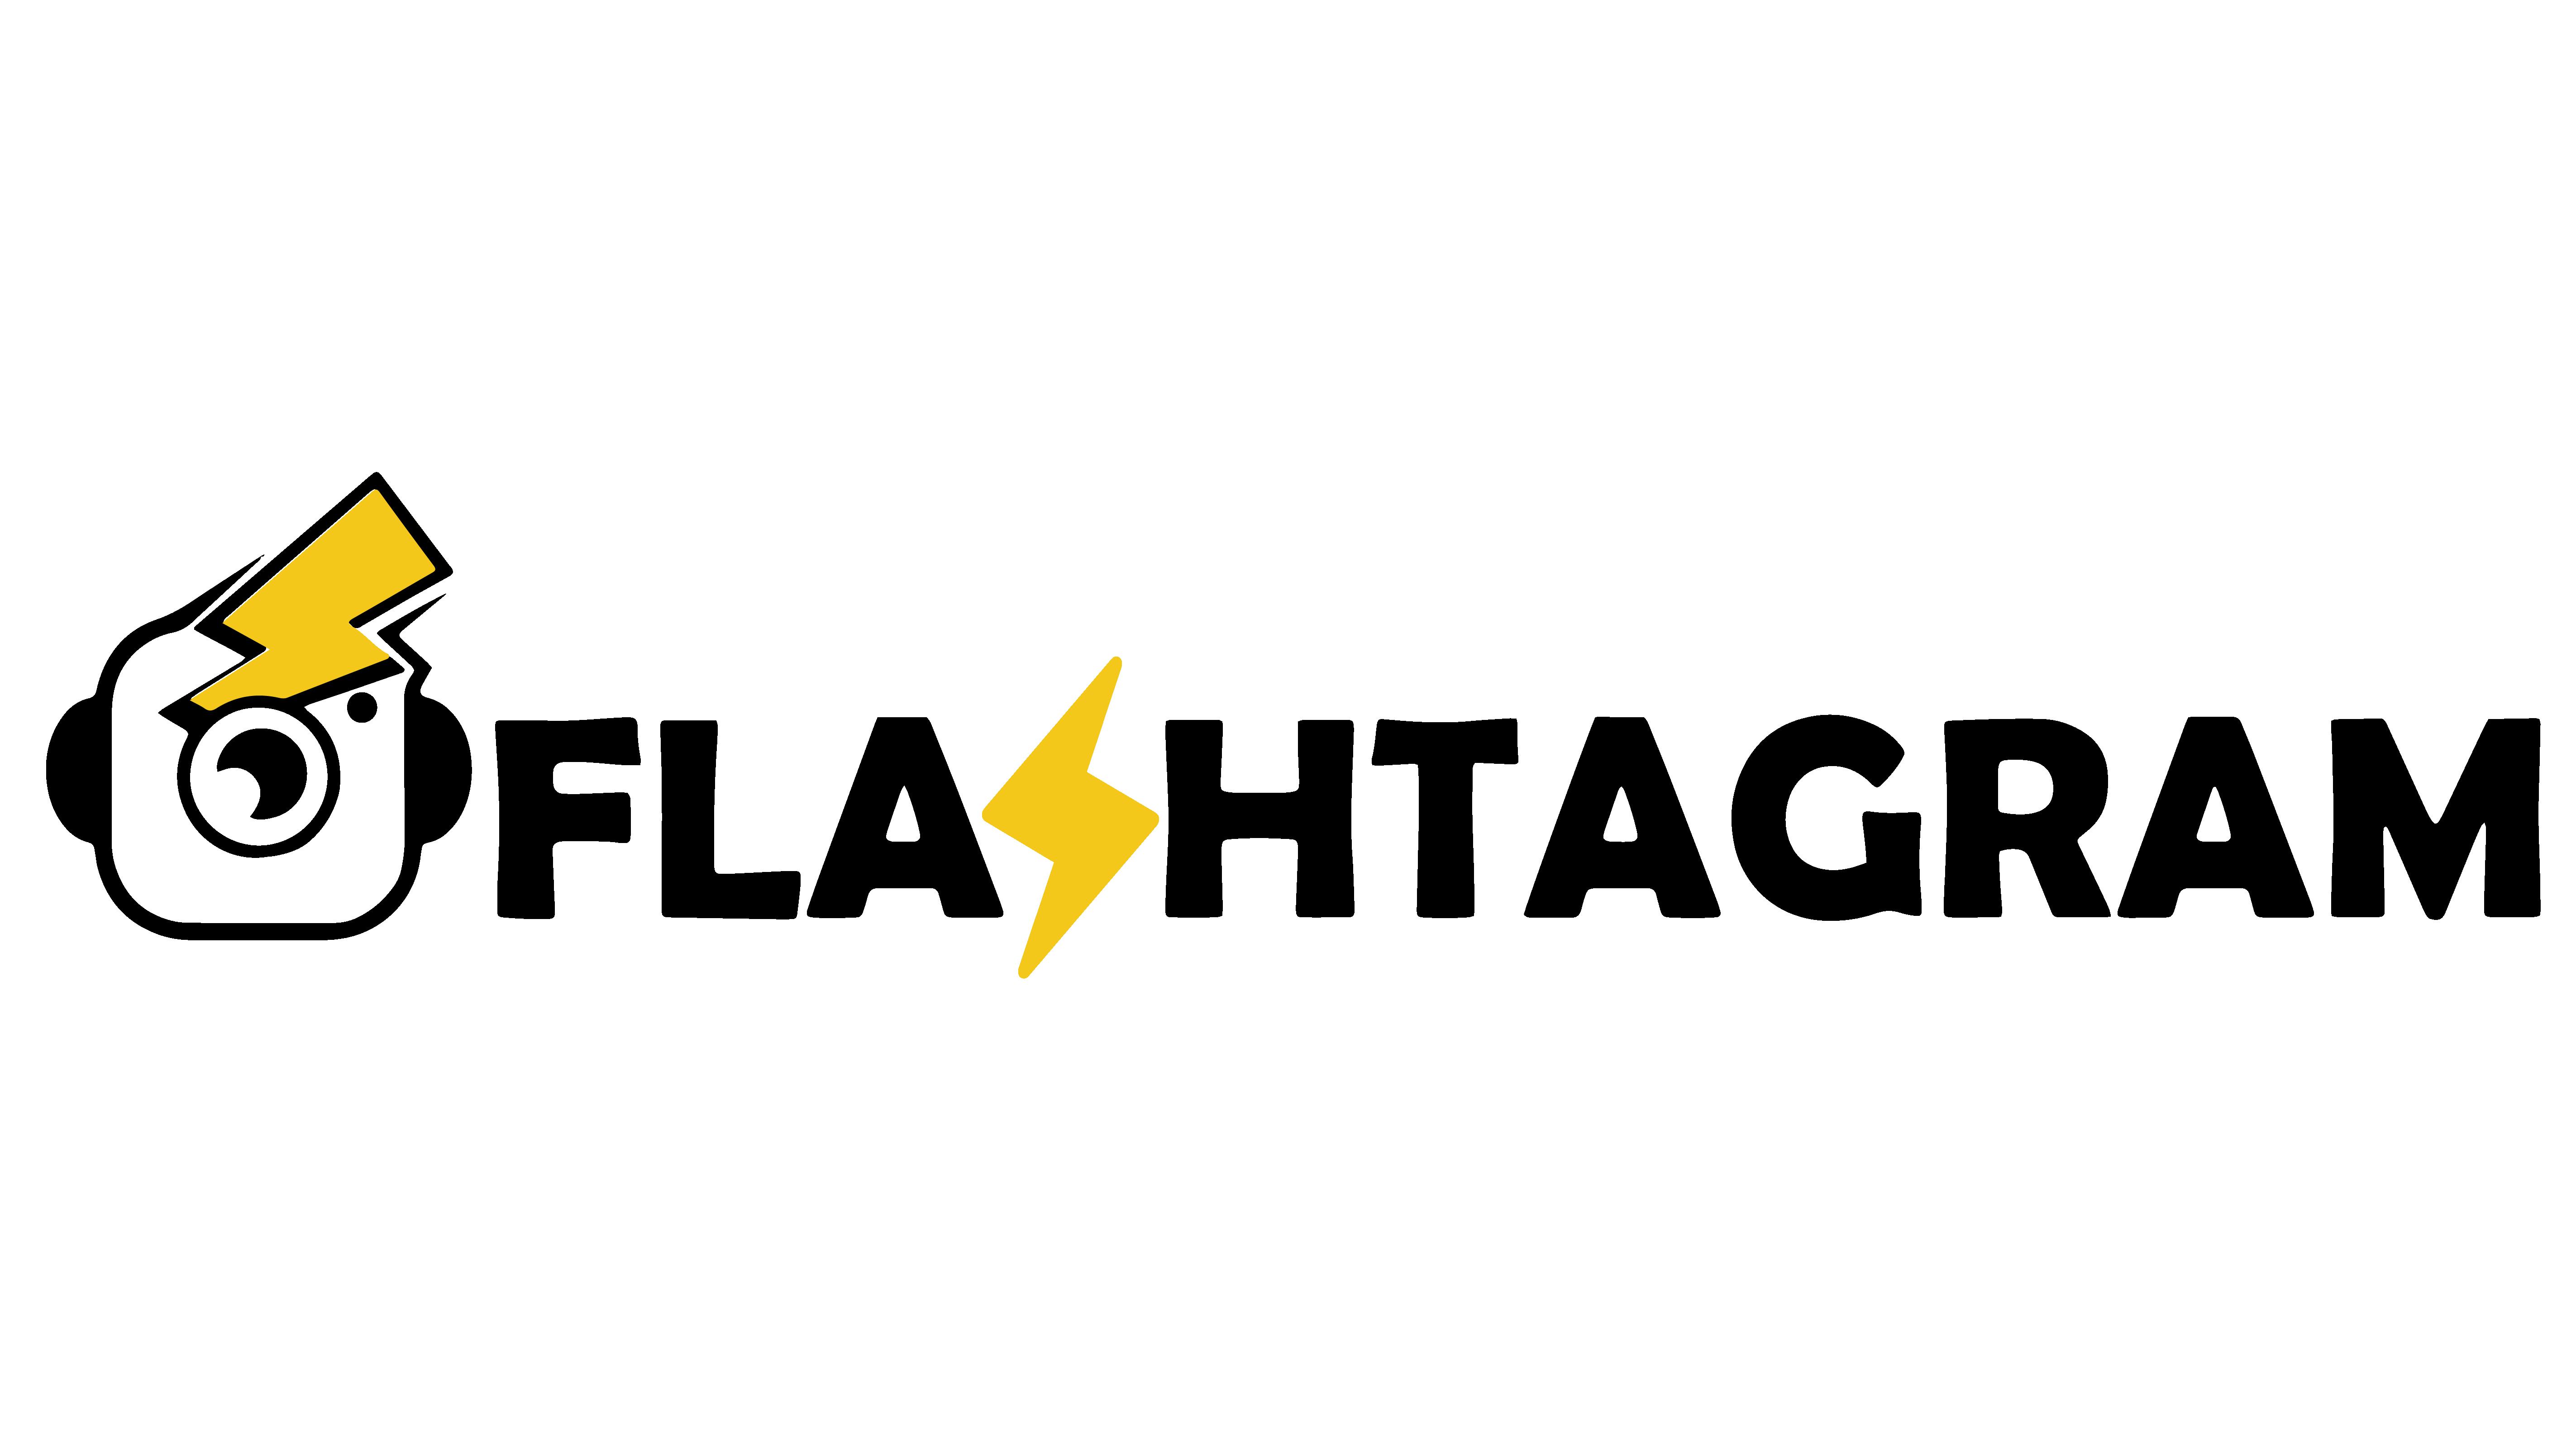 Flashtagram